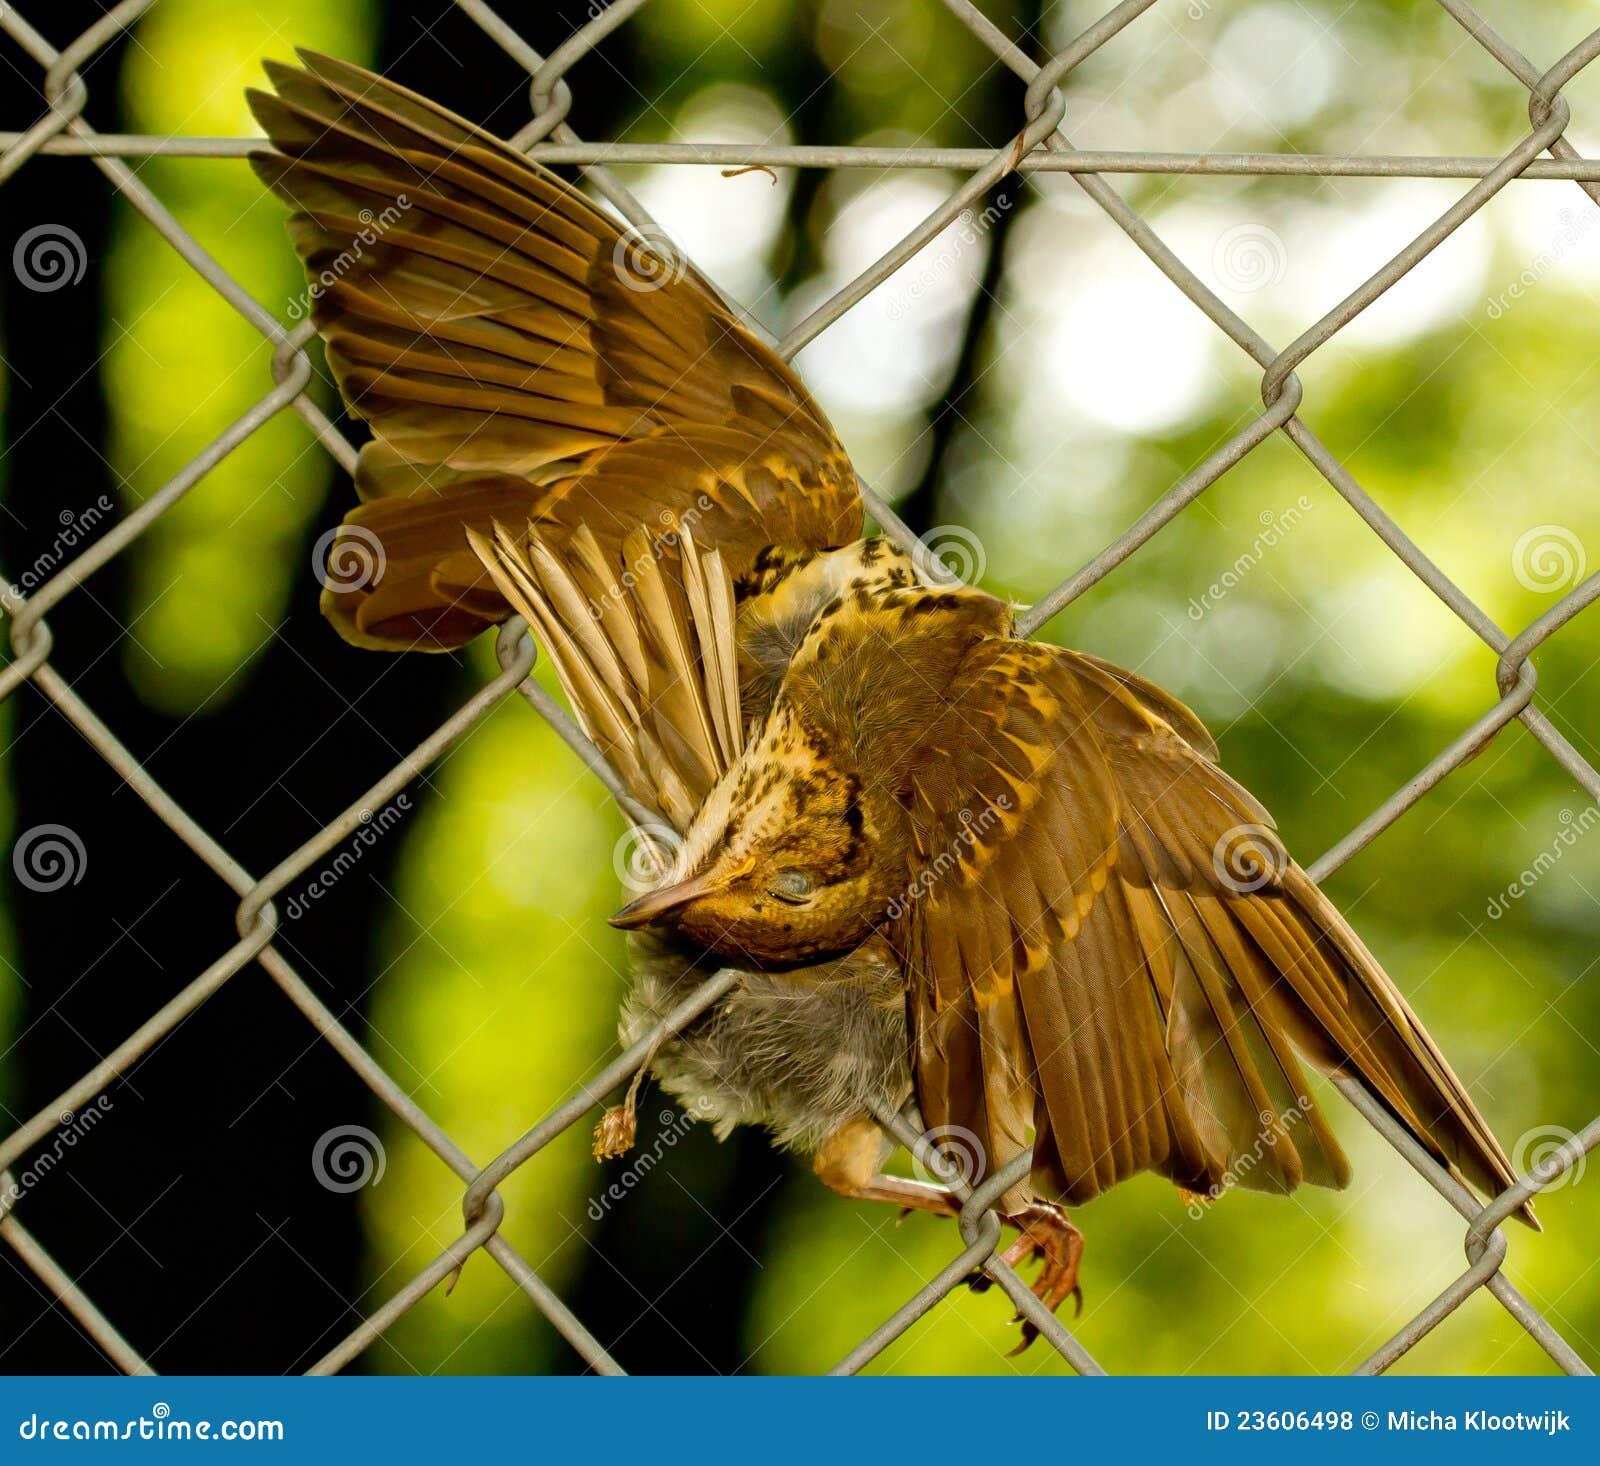 A dead bird is hanging